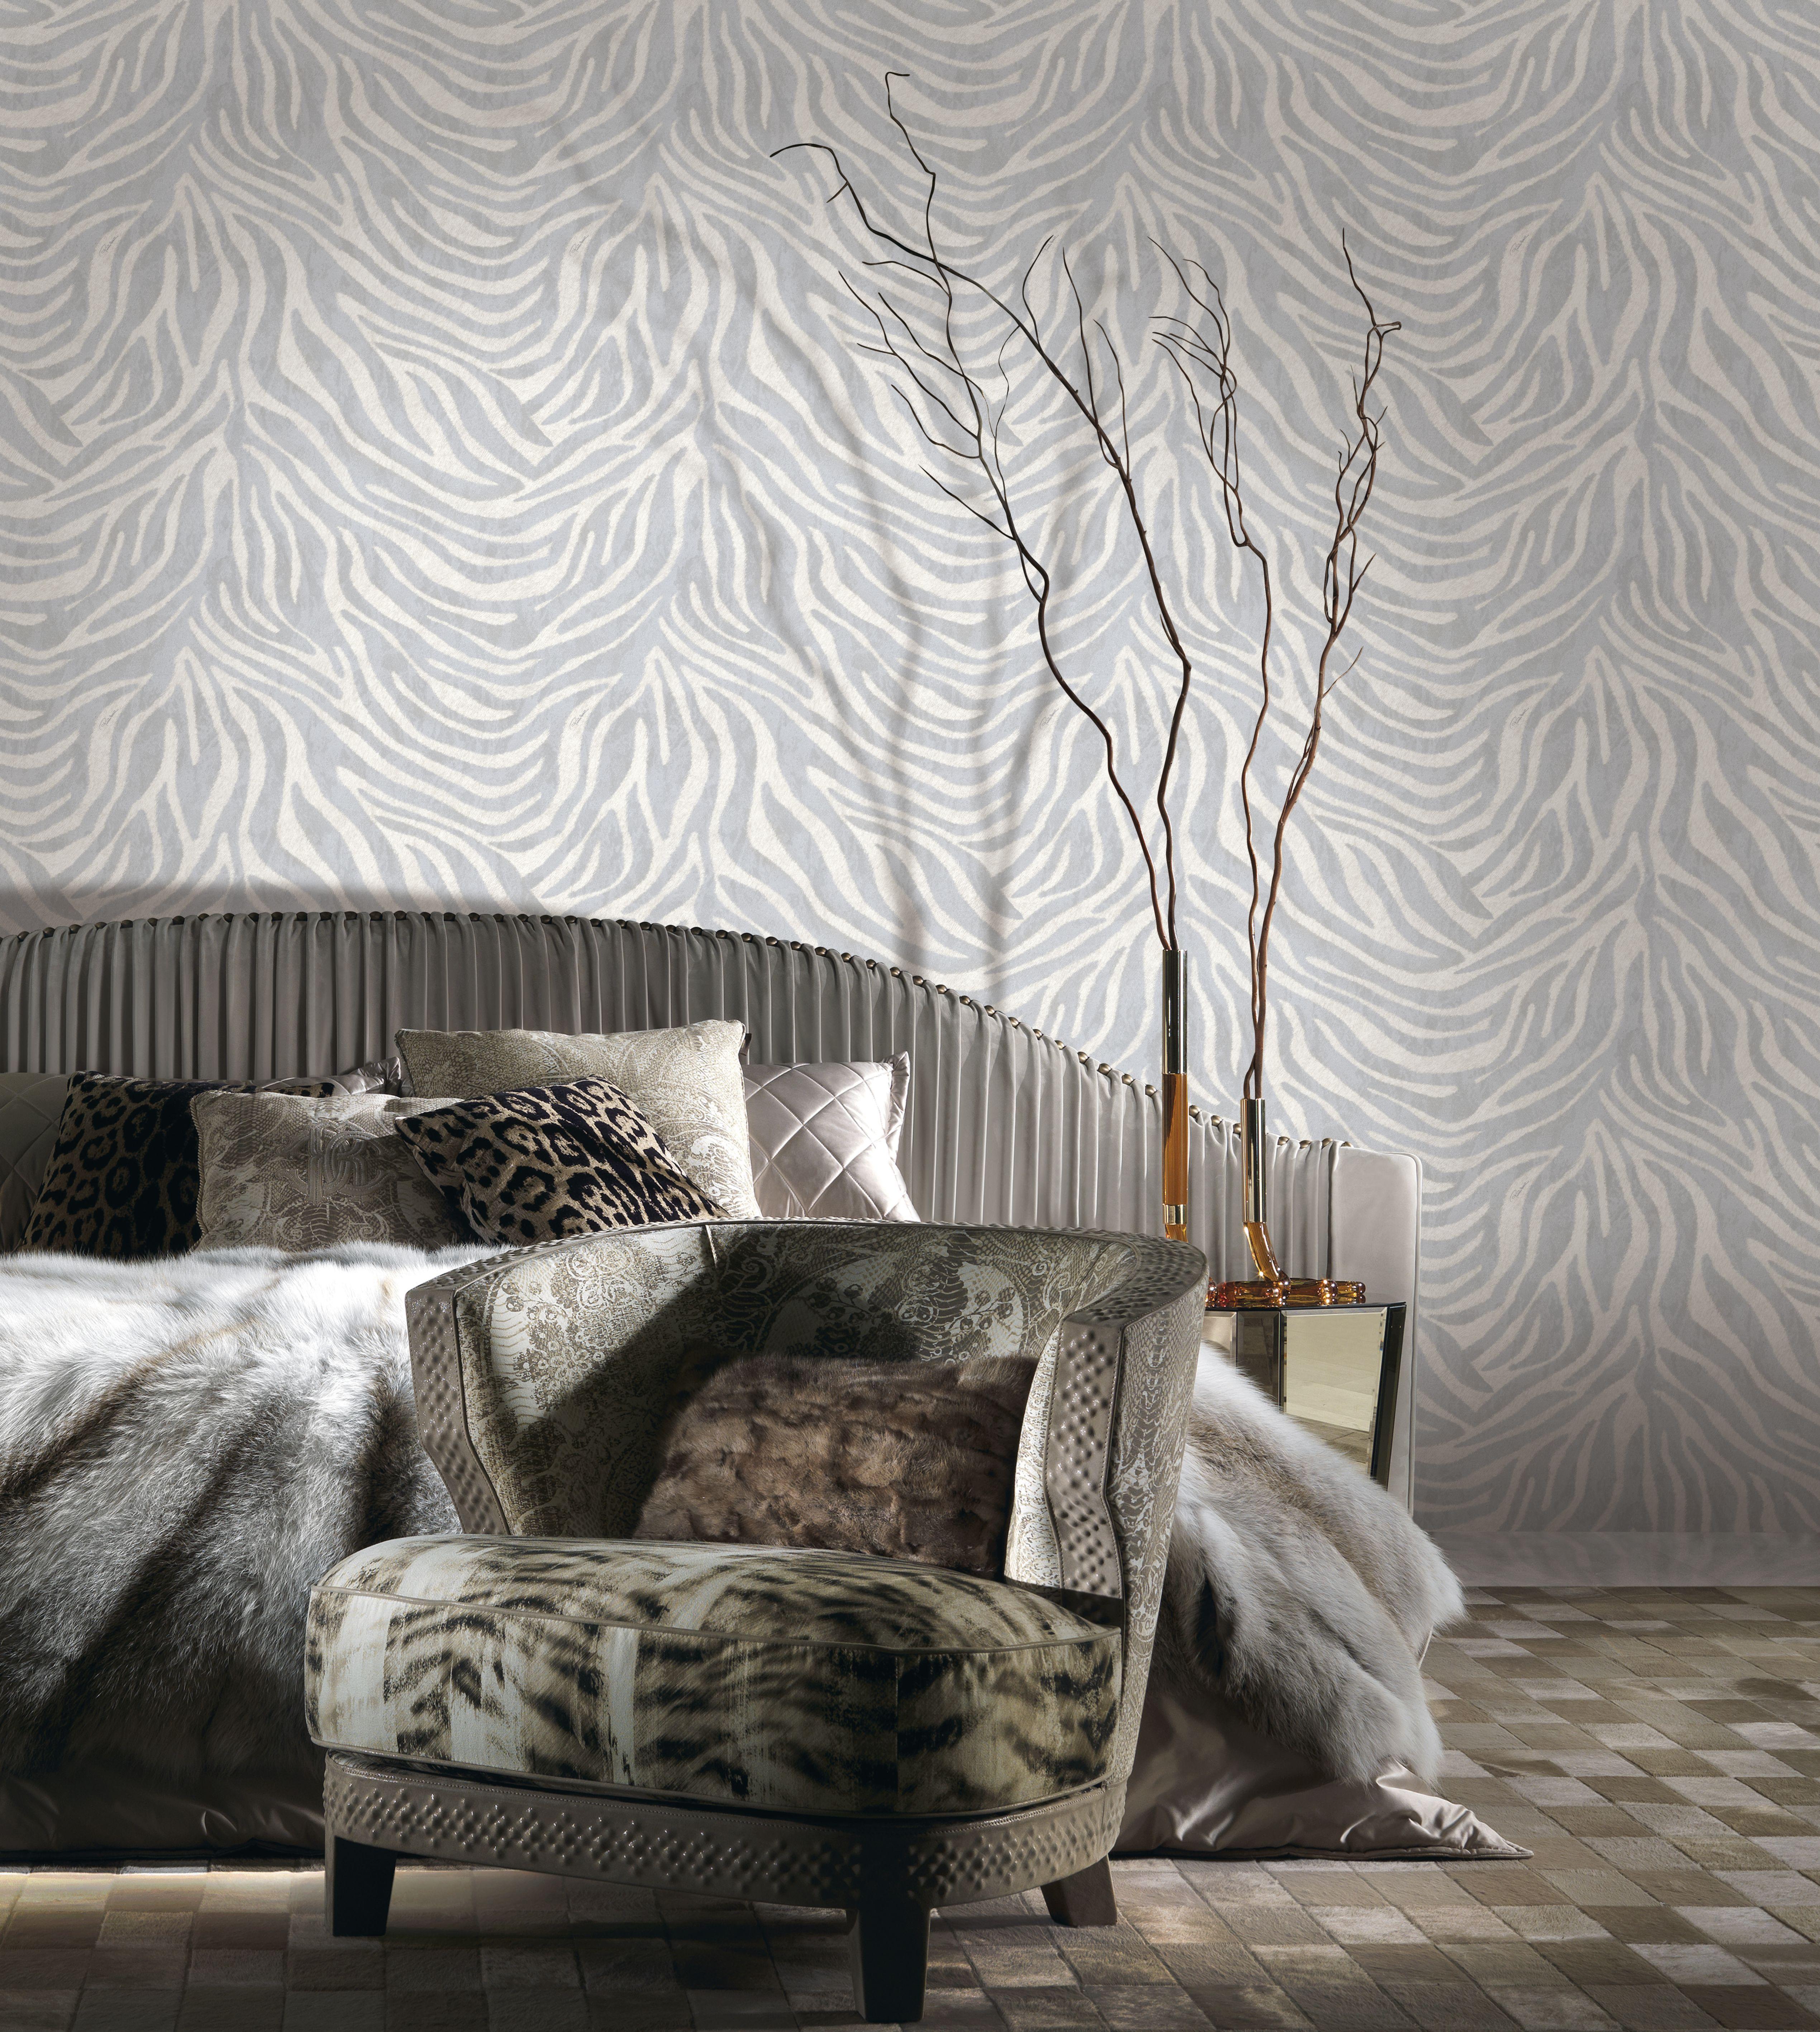 2020的Zebra skin animal print wallpaper RC15032